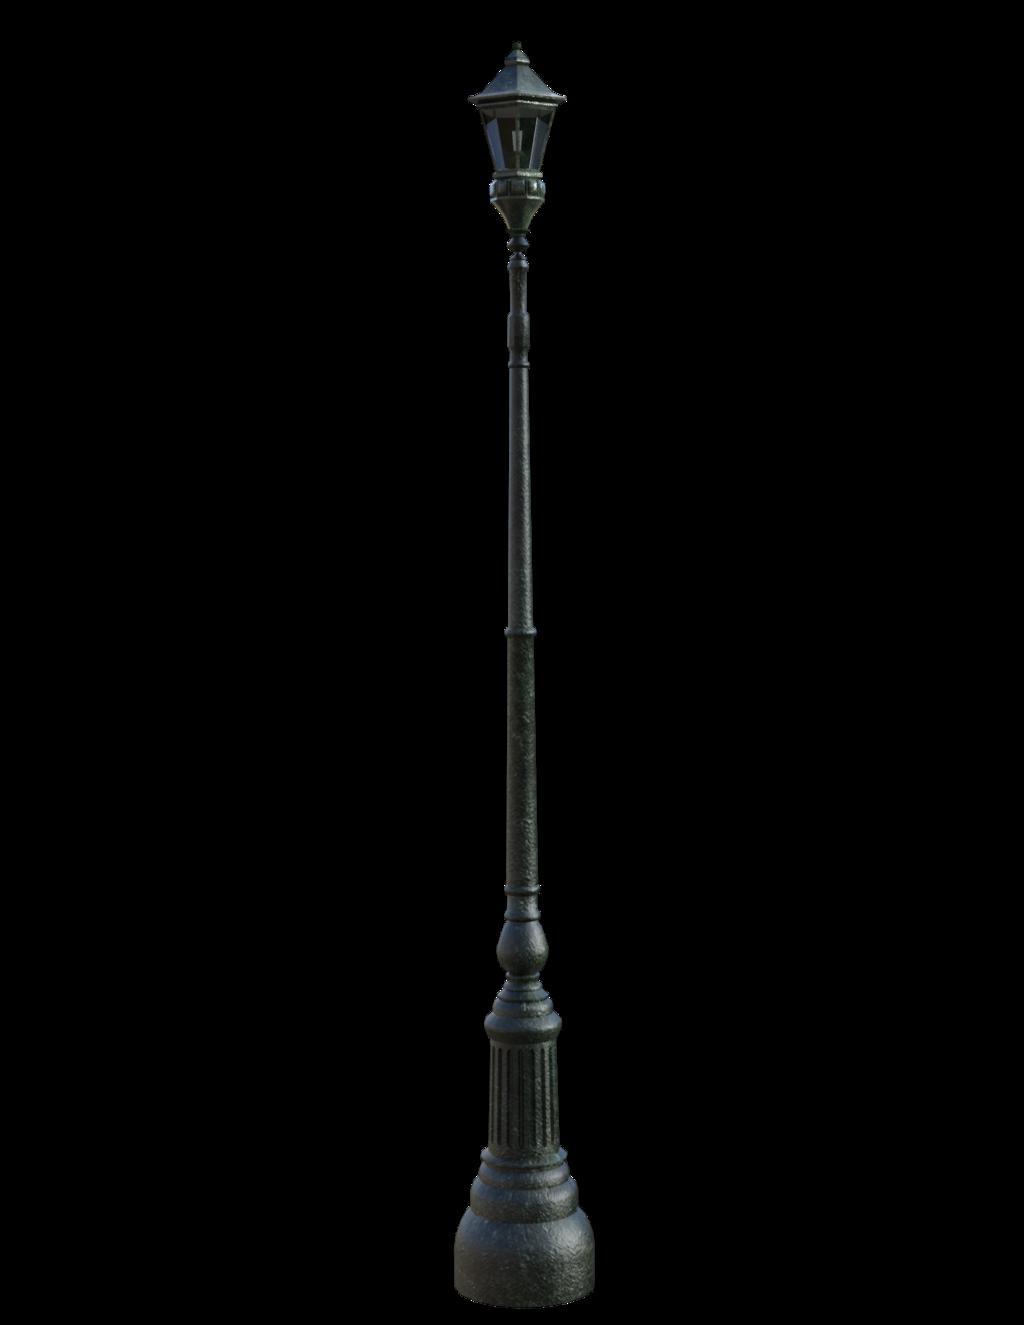 Streetlamp HD PNG - 119910